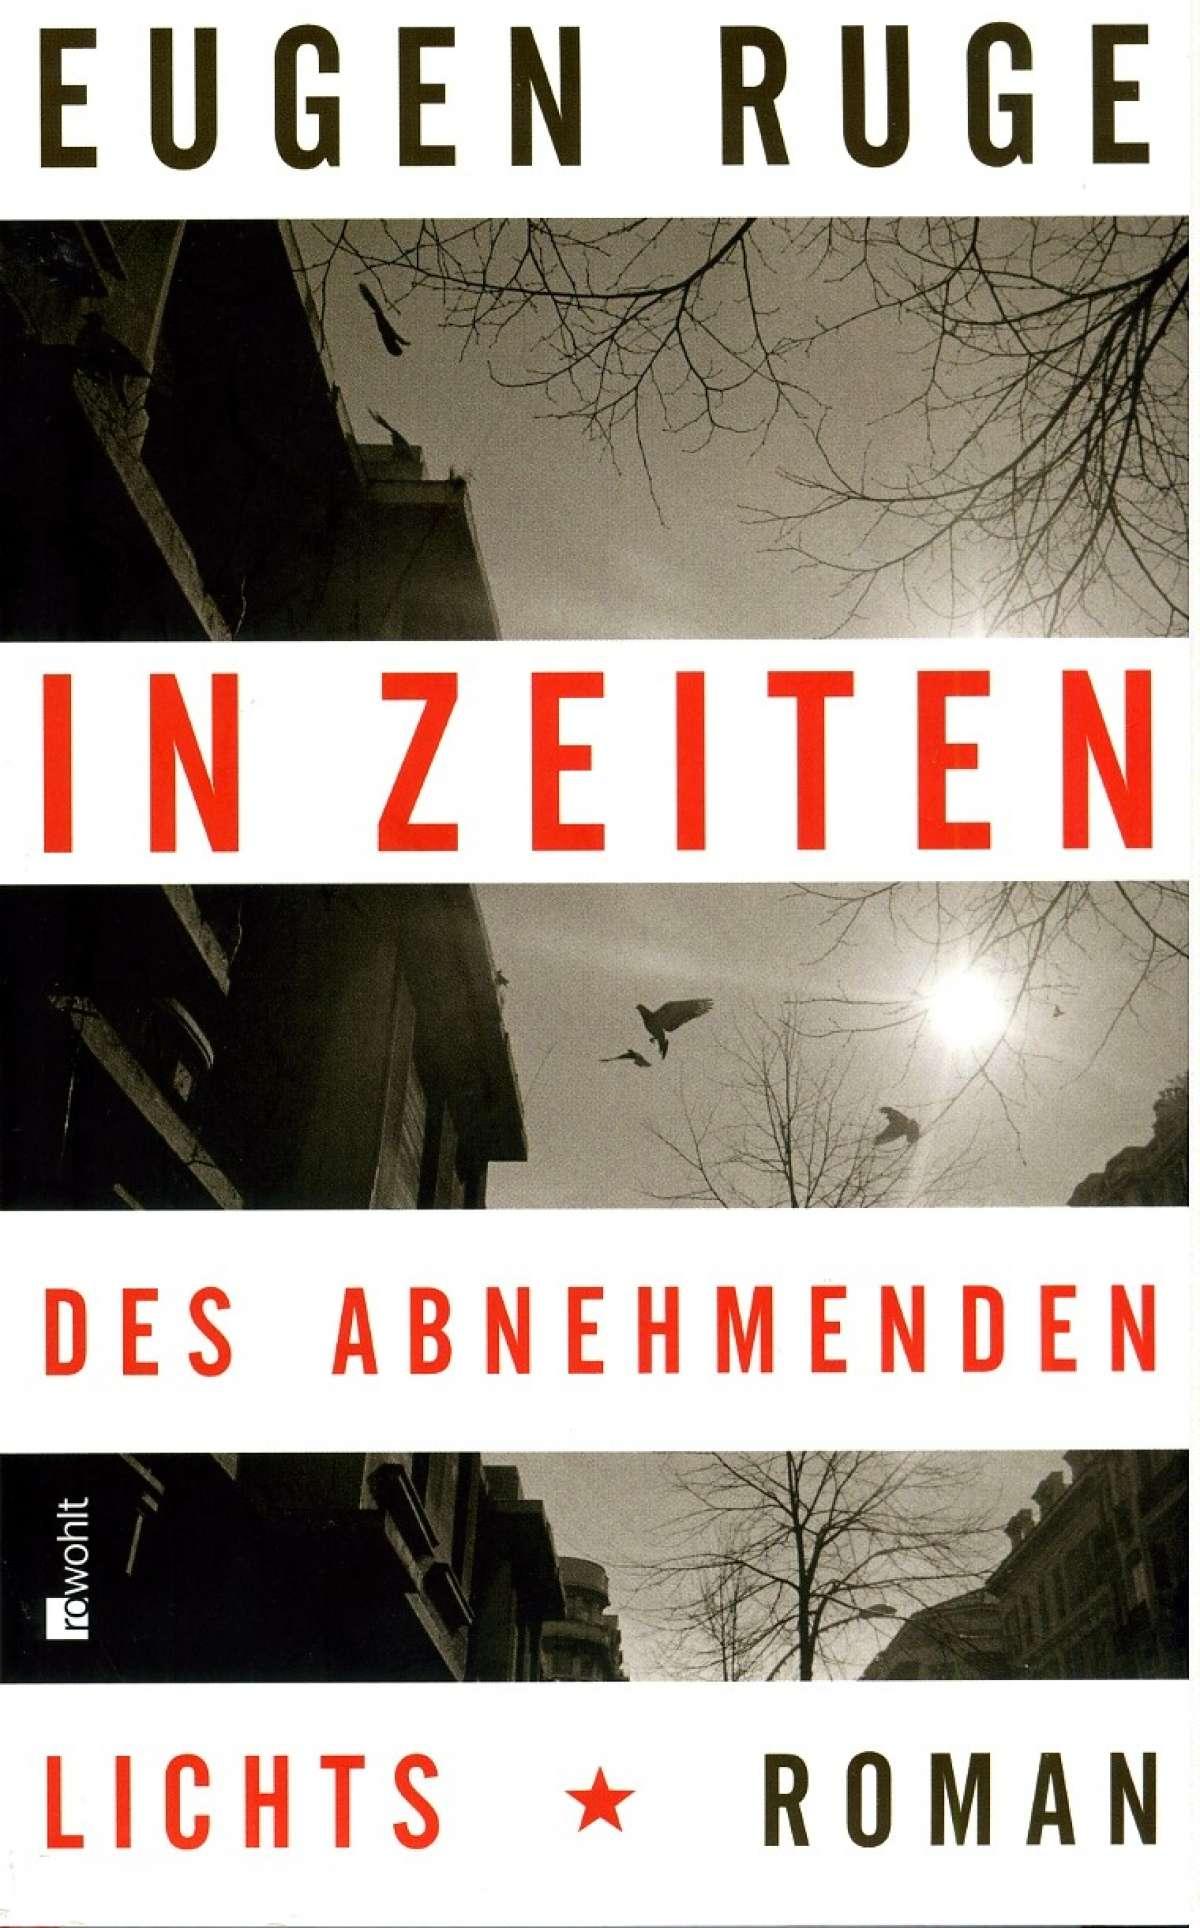 Lesung: Klaus-Peter Lorenz liest Eugen Ruges